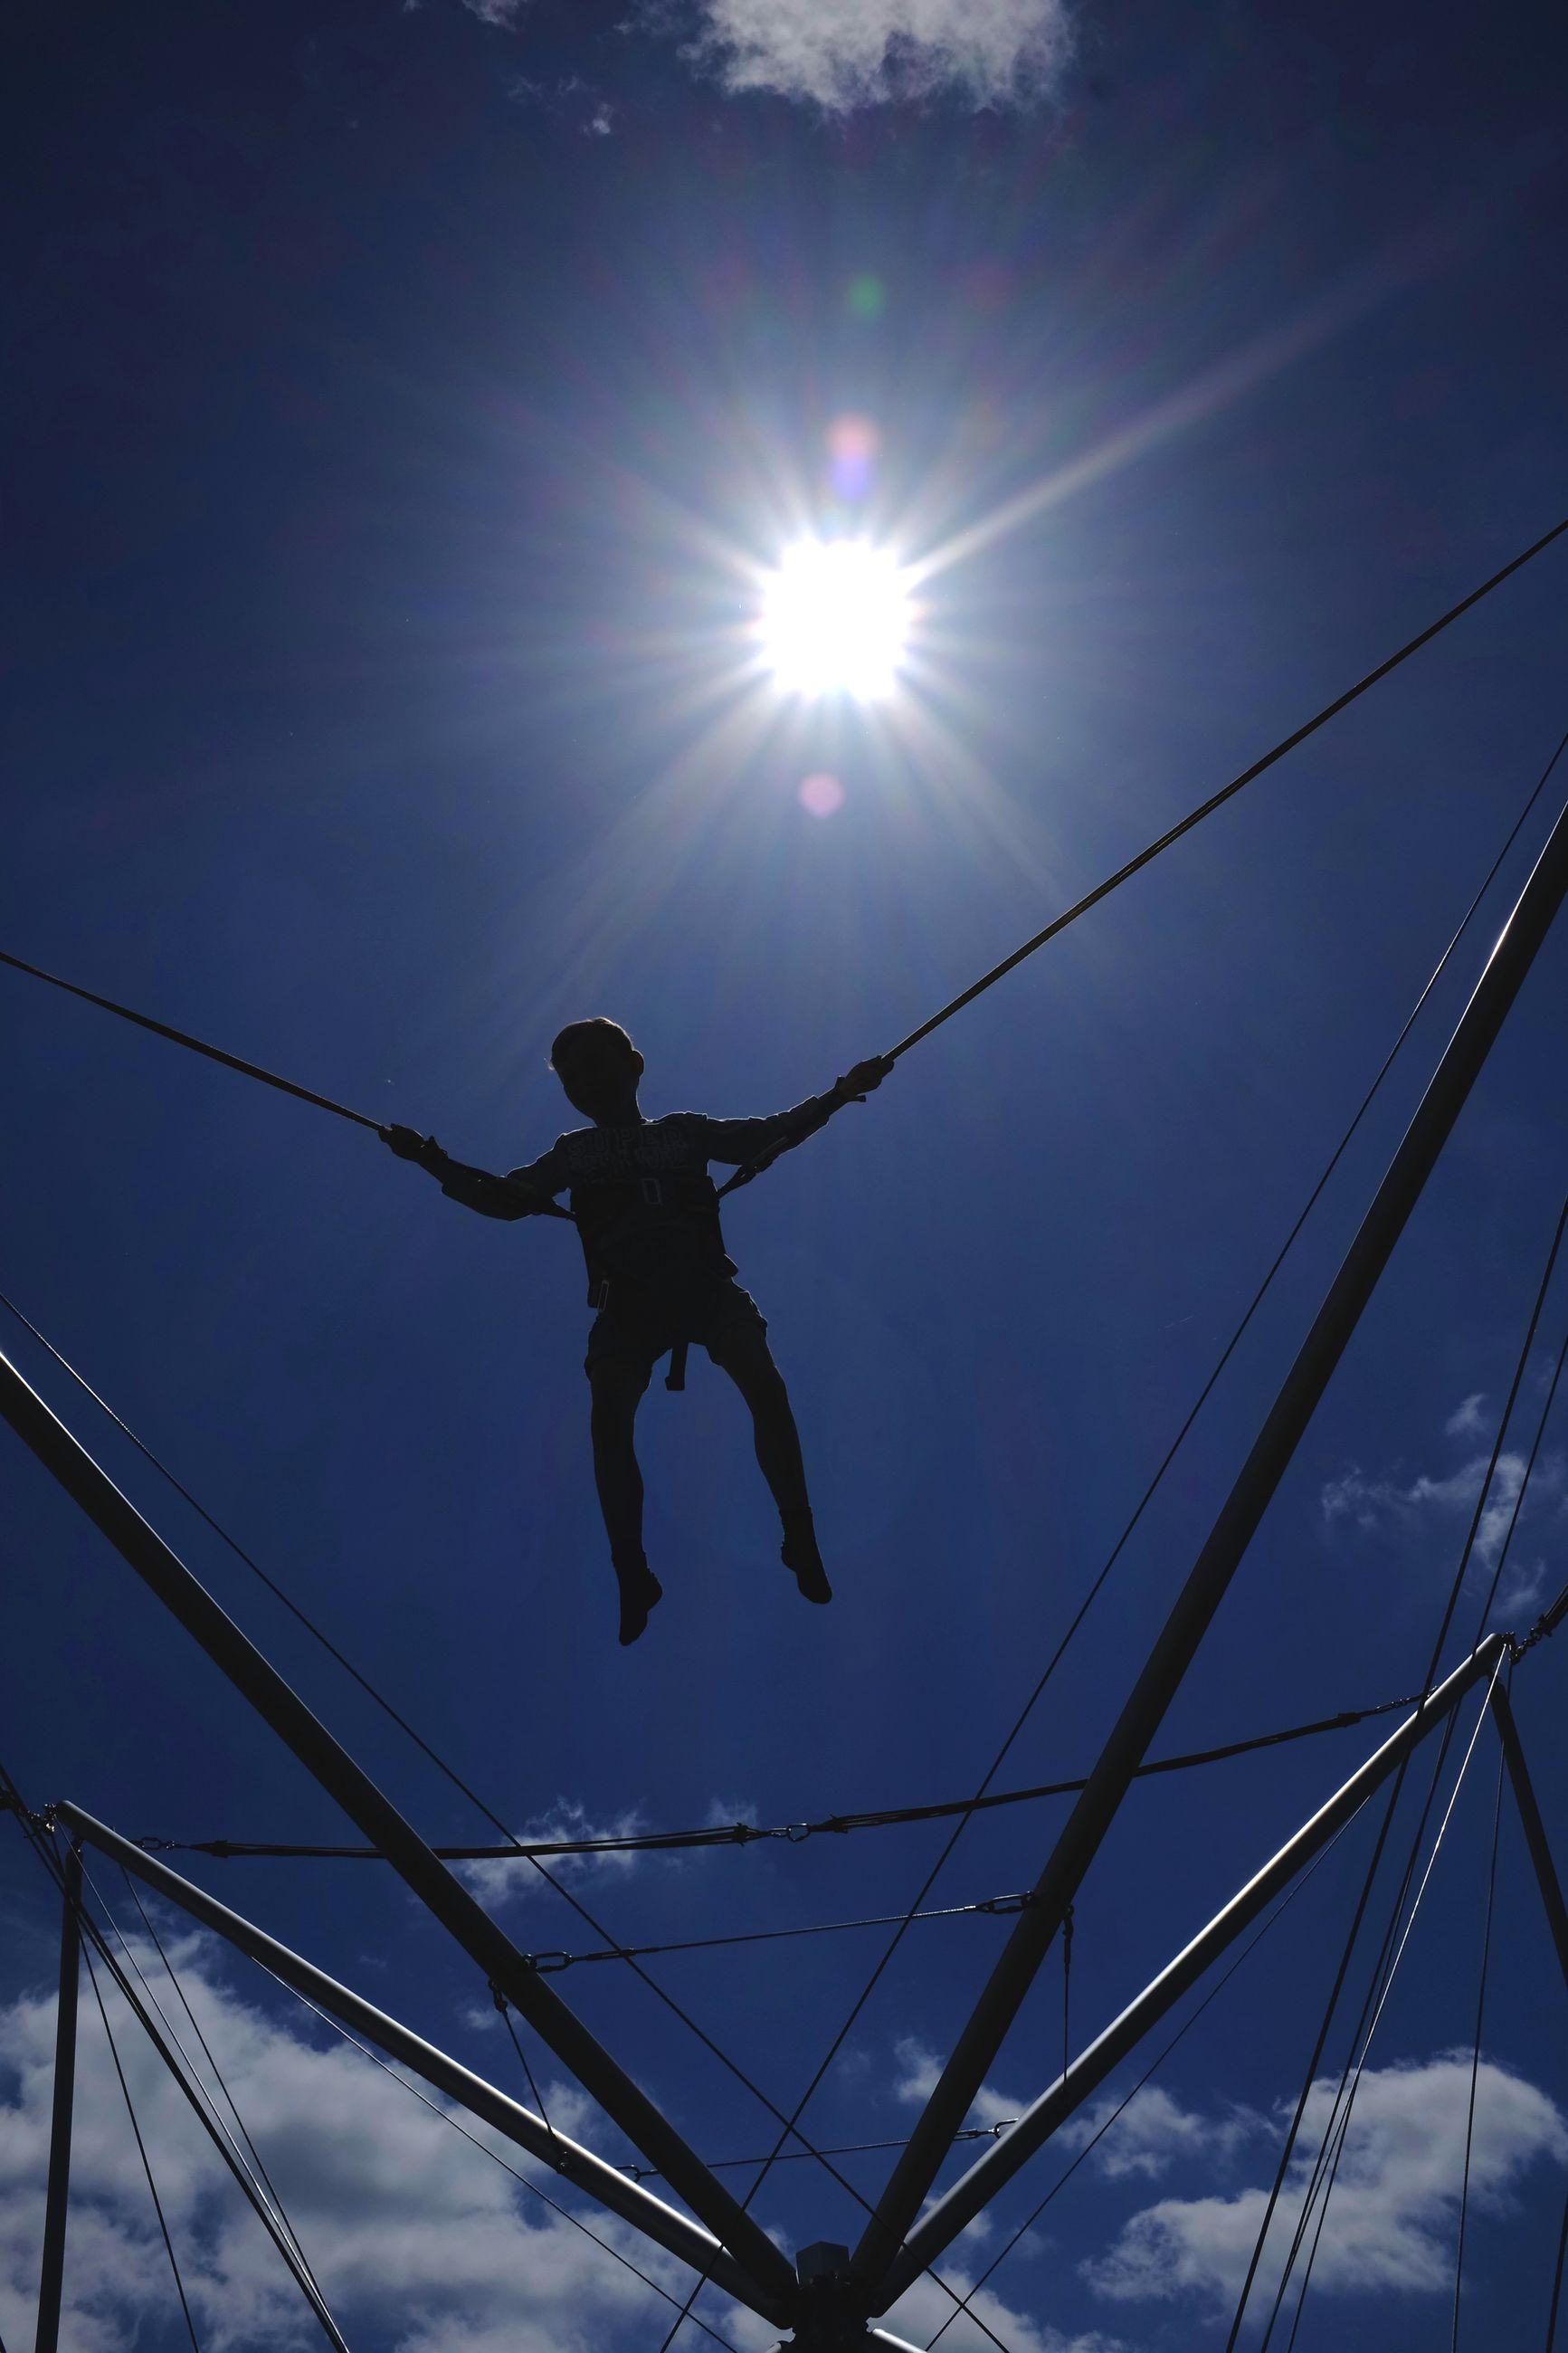 low angle view, leisure activity, sky, lifestyles, enjoyment, sun, fun, transportation, mid-air, extreme sports, sunlight, full length, lens flare, men, sunbeam, blue, silhouette, adventure